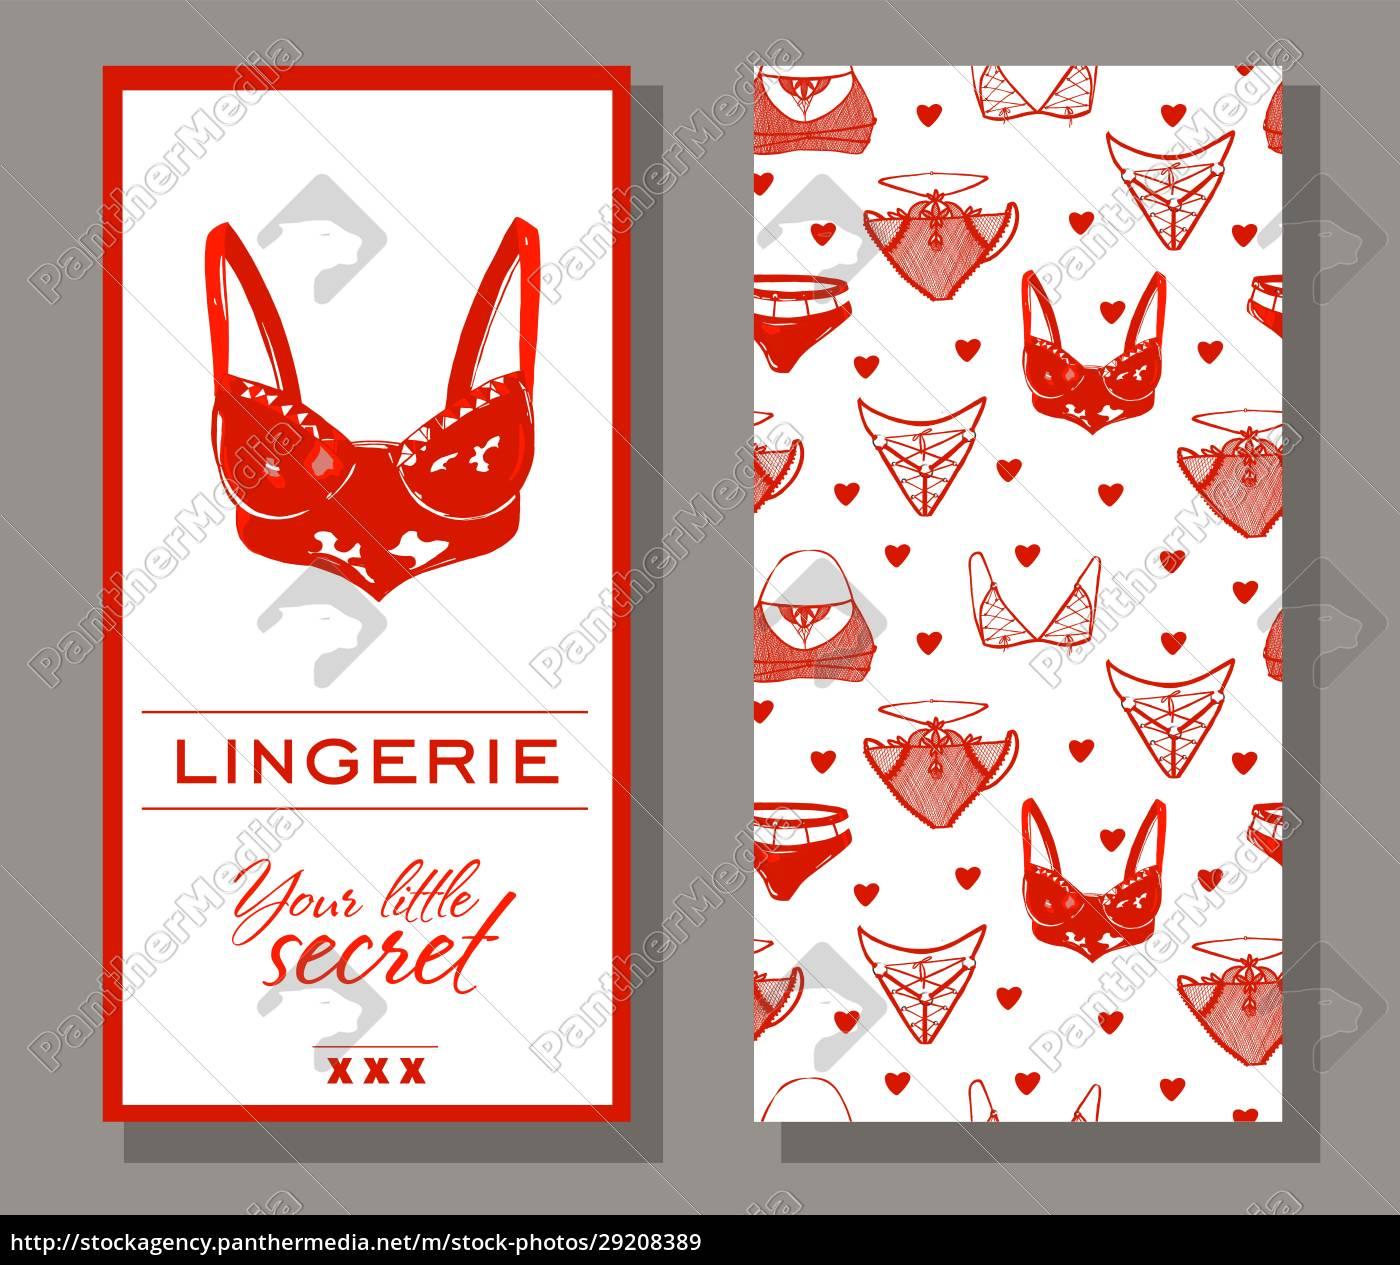 linen, tag, , logo., corporate, identity, lingerie. - 29208389